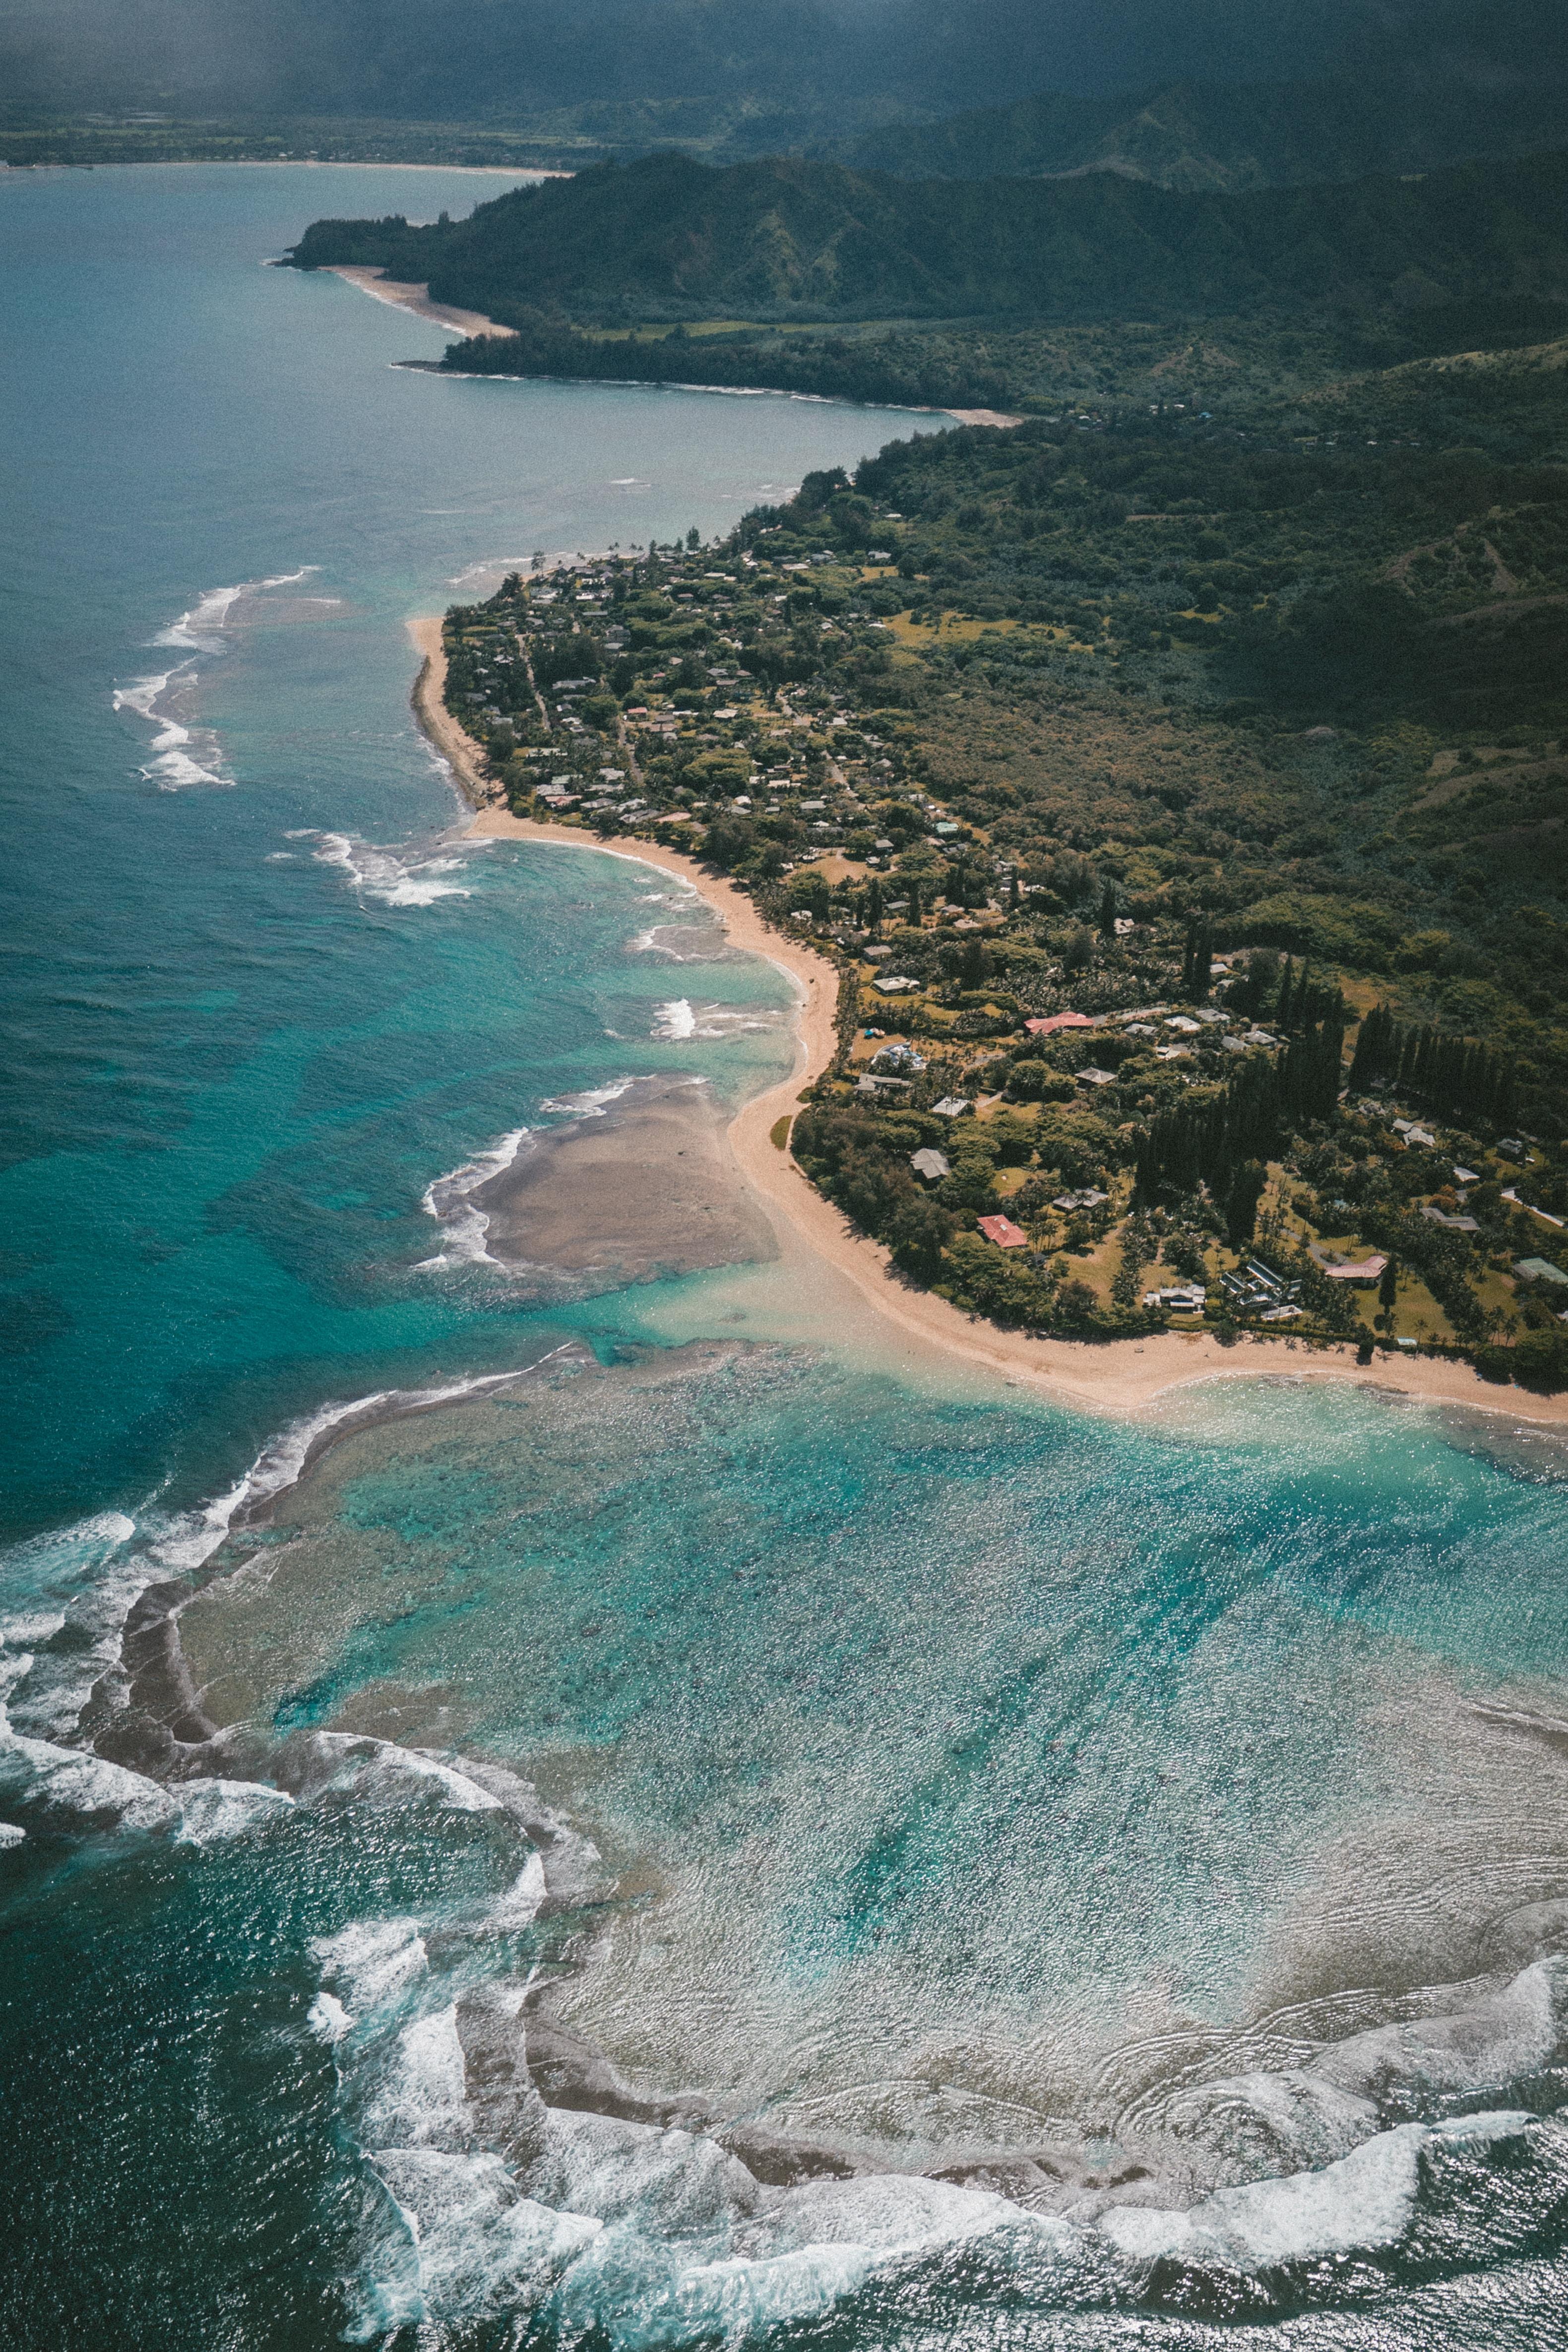 aerial photography of ocean taken at daytime